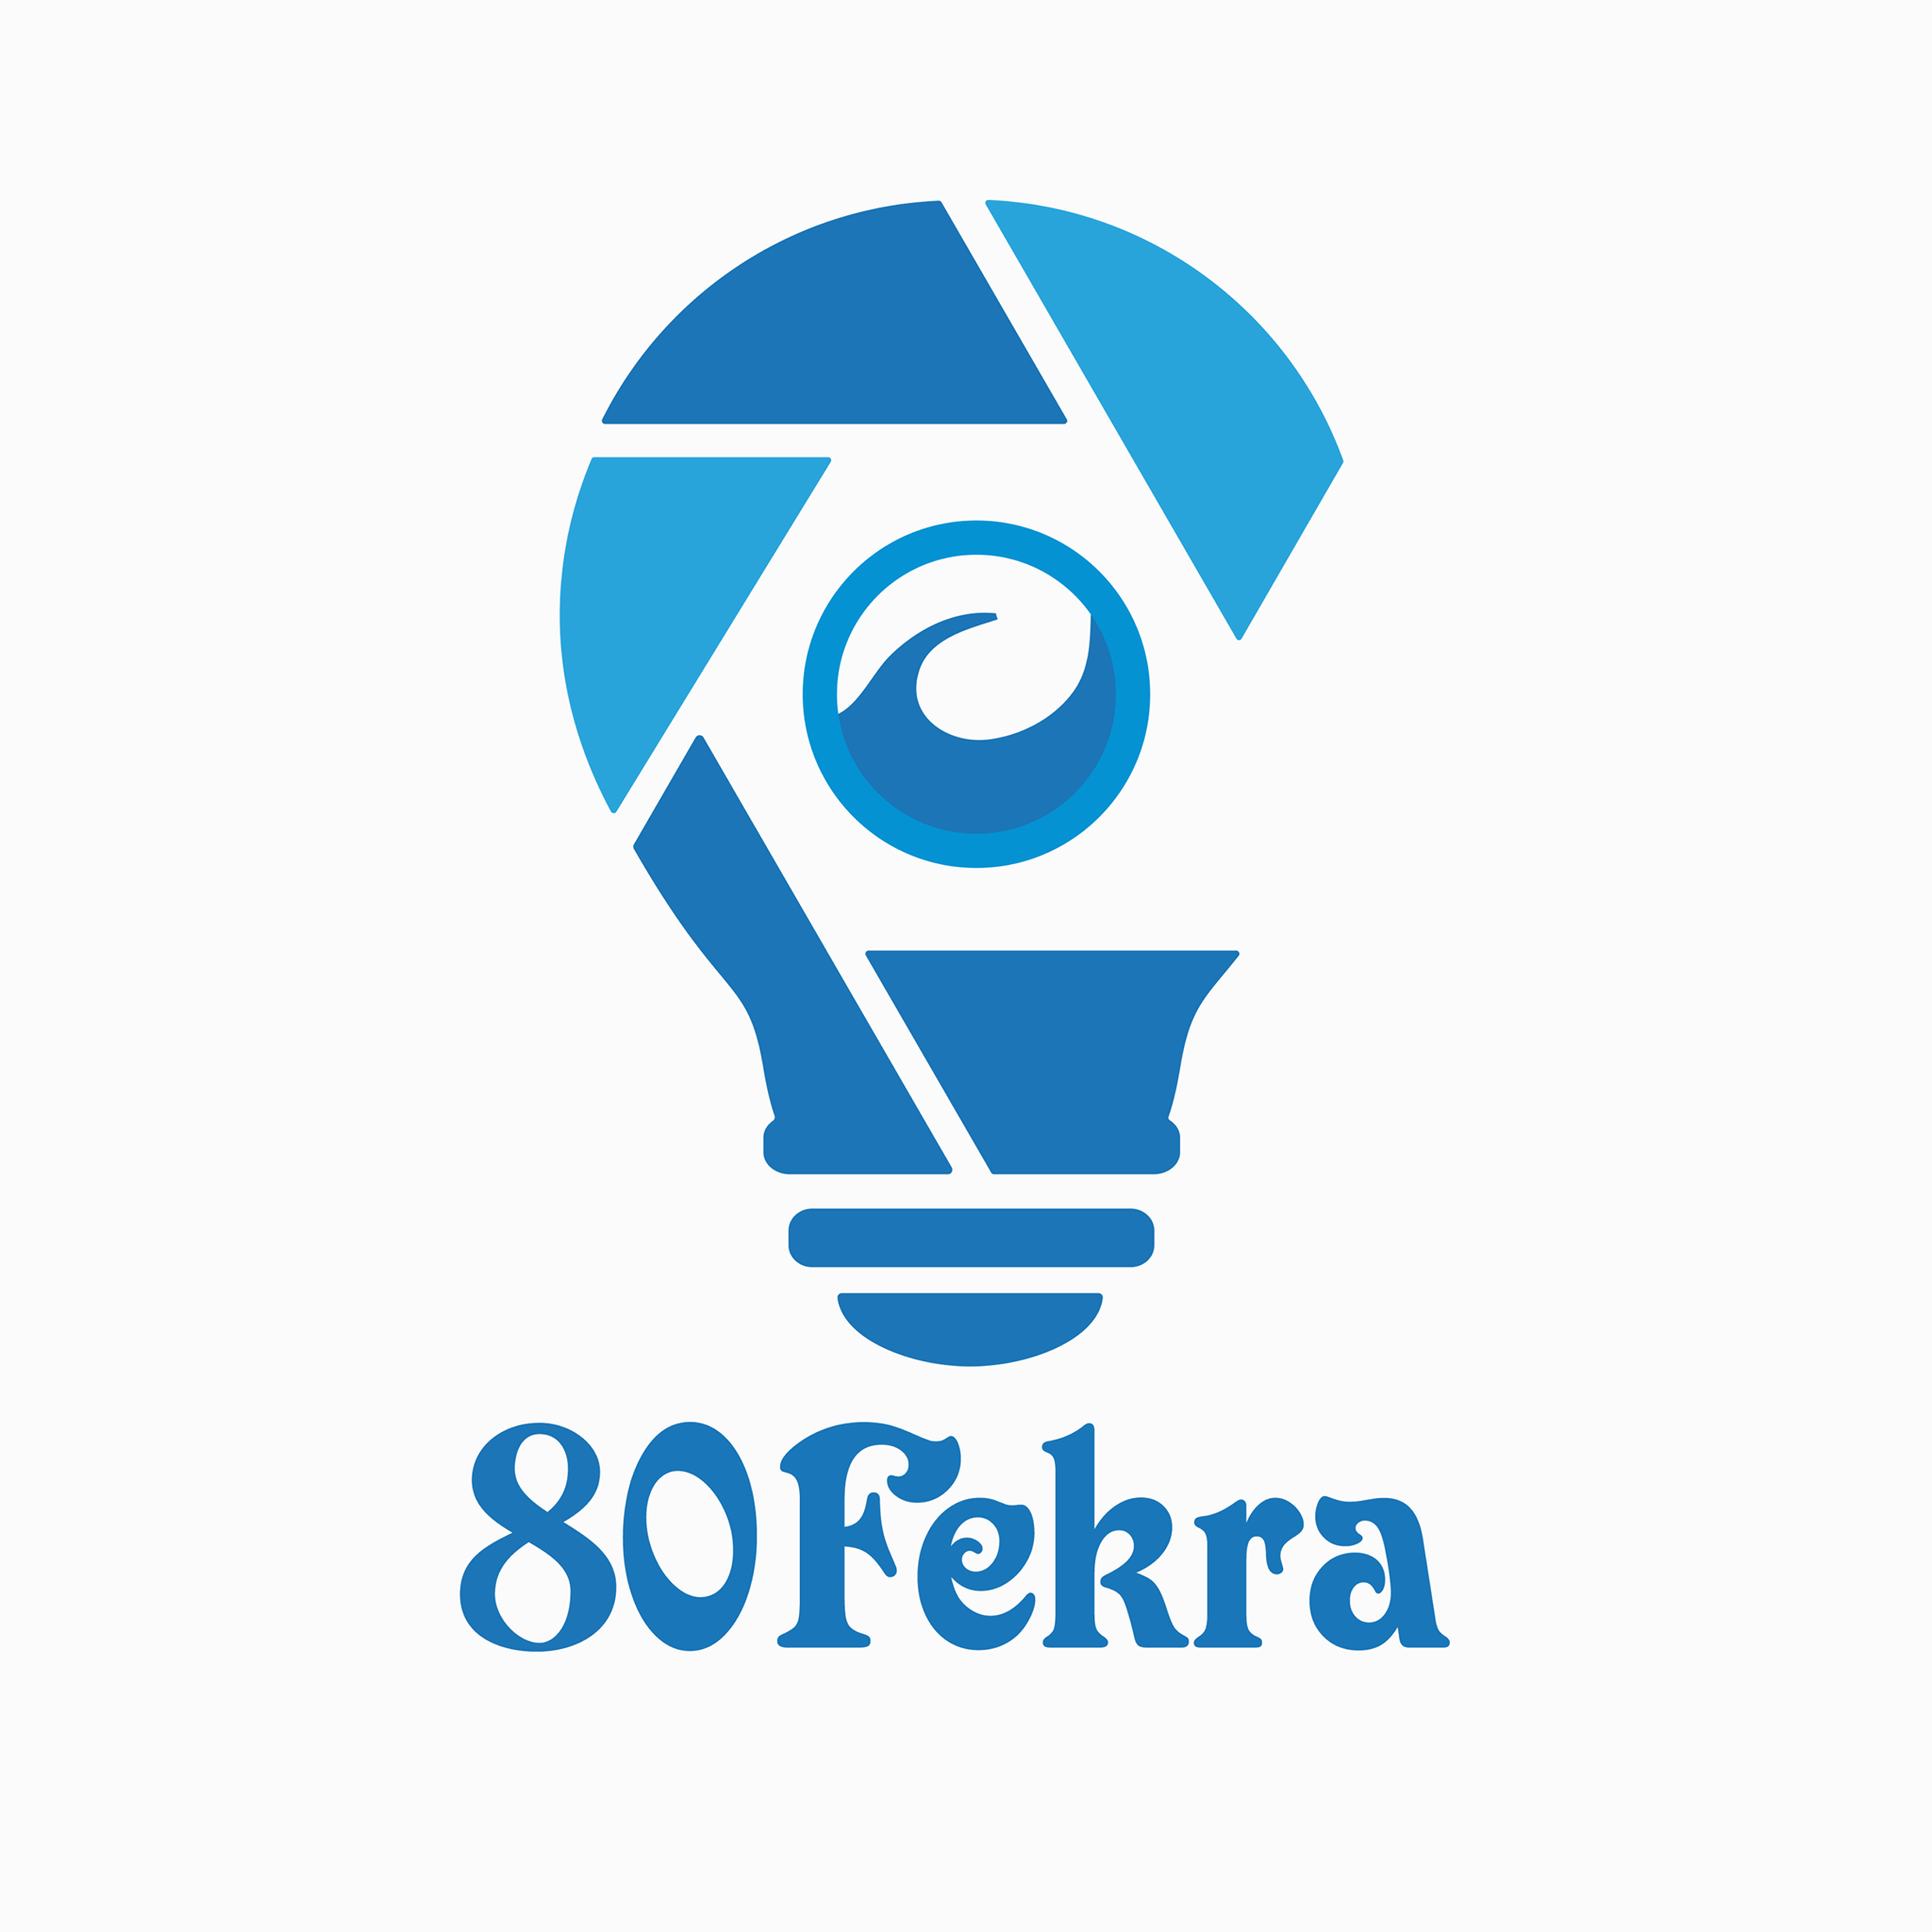 80 Fekra